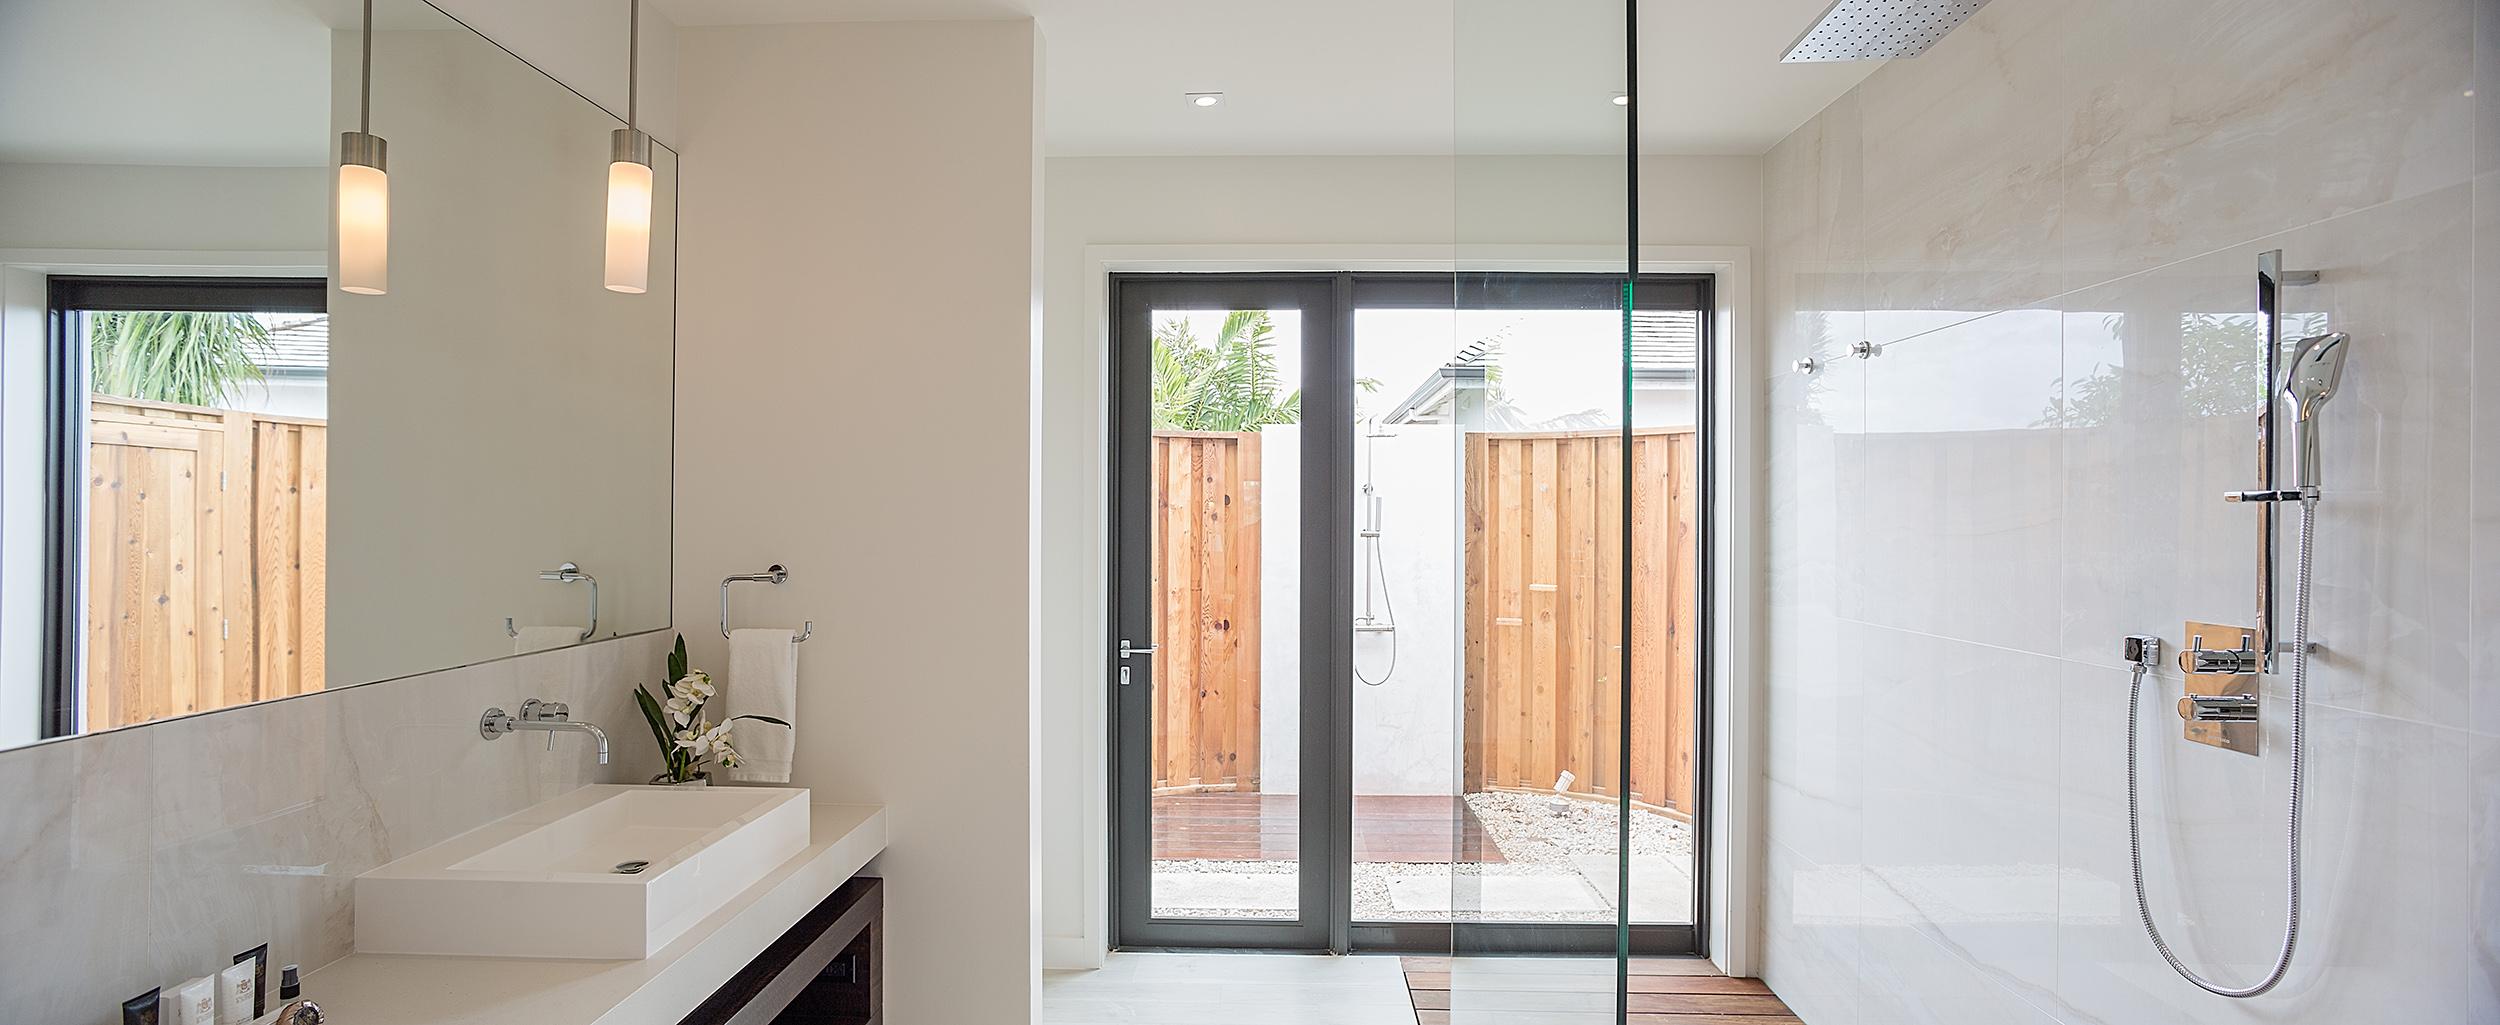 Brise De Mer - view of a bathroom with external shower area